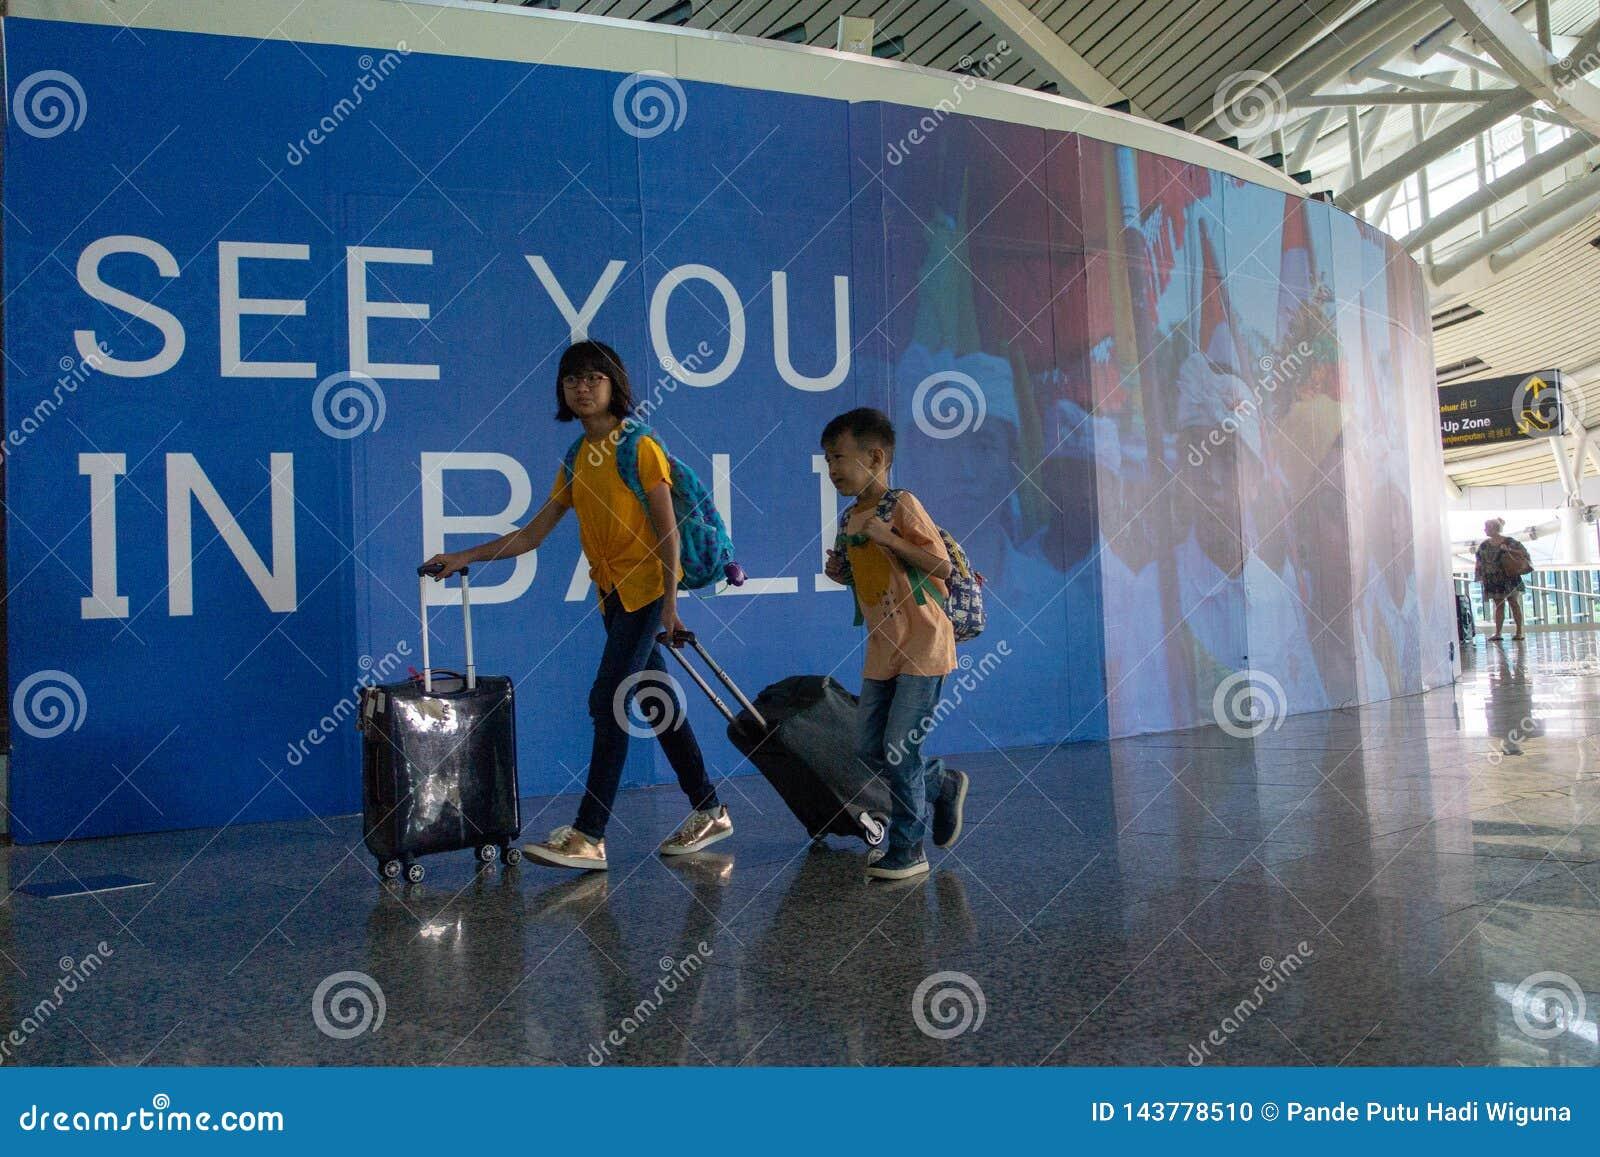 BADUNG,BALI/INDONESIA 6月25日2018年:两年轻旅行家给离开终端带来他们的手提箱在拉伊巴克罕巴厘岛